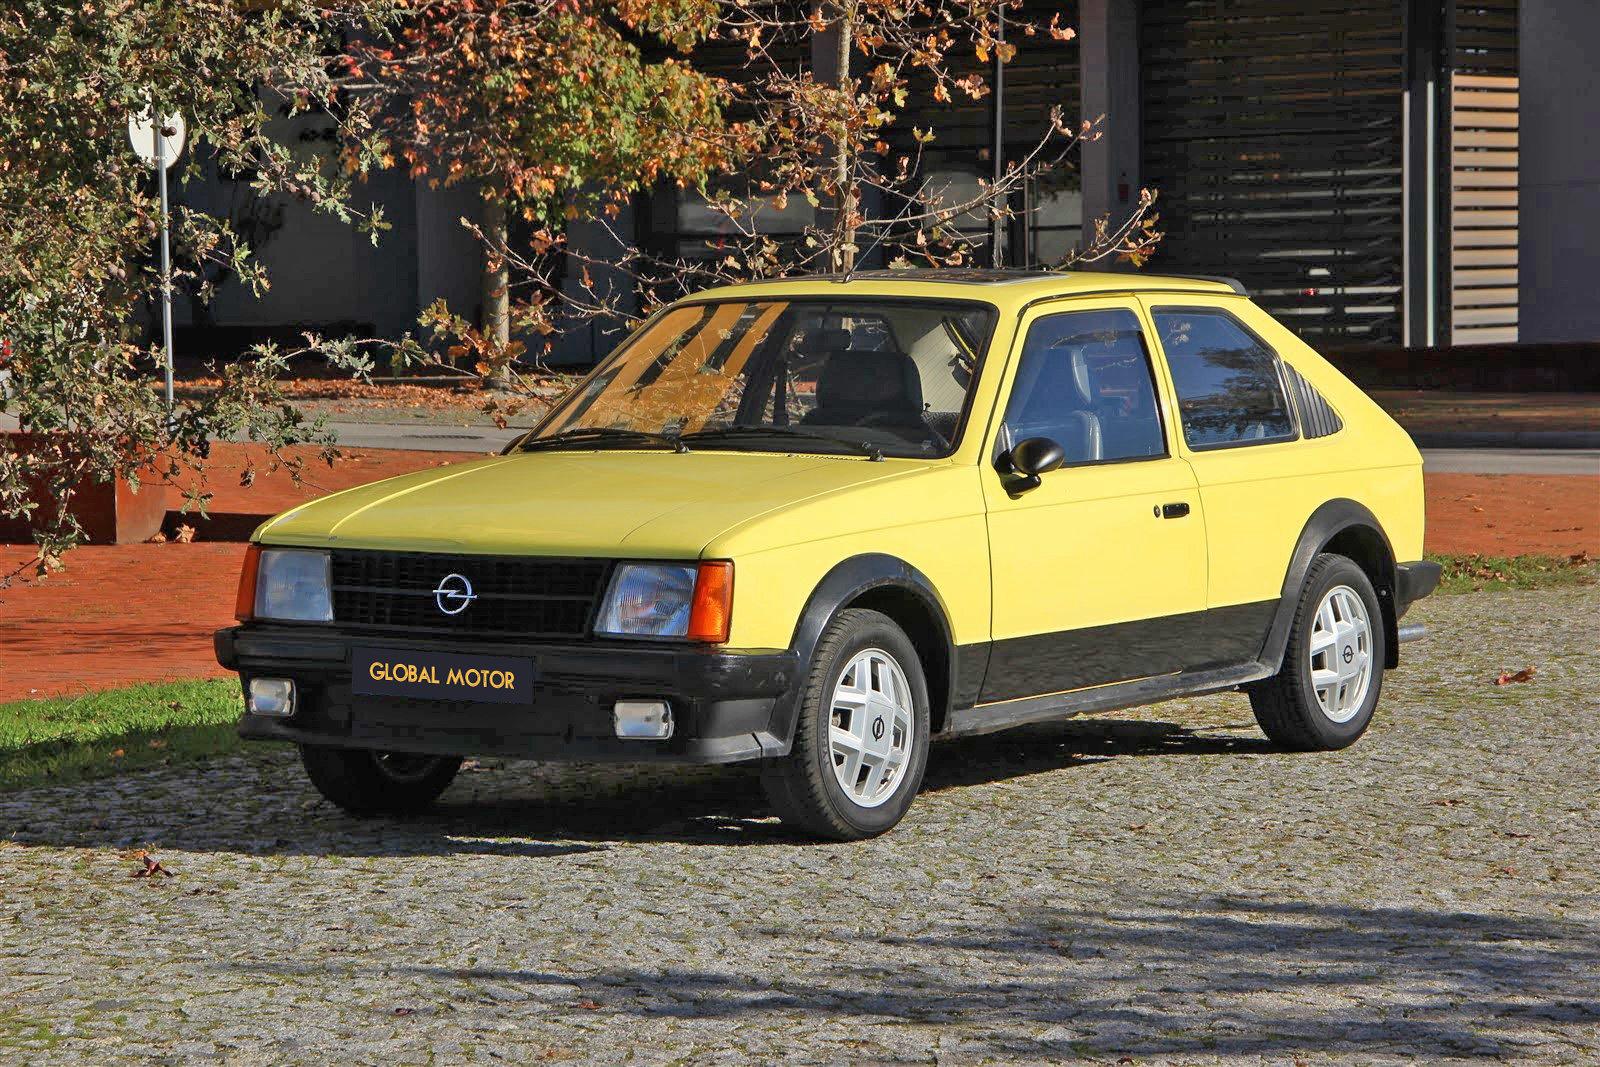 1981 Vauxhall Astra 1.3 SR | Opel Kadett 1.3 SR For Sale (picture 1 of 6)